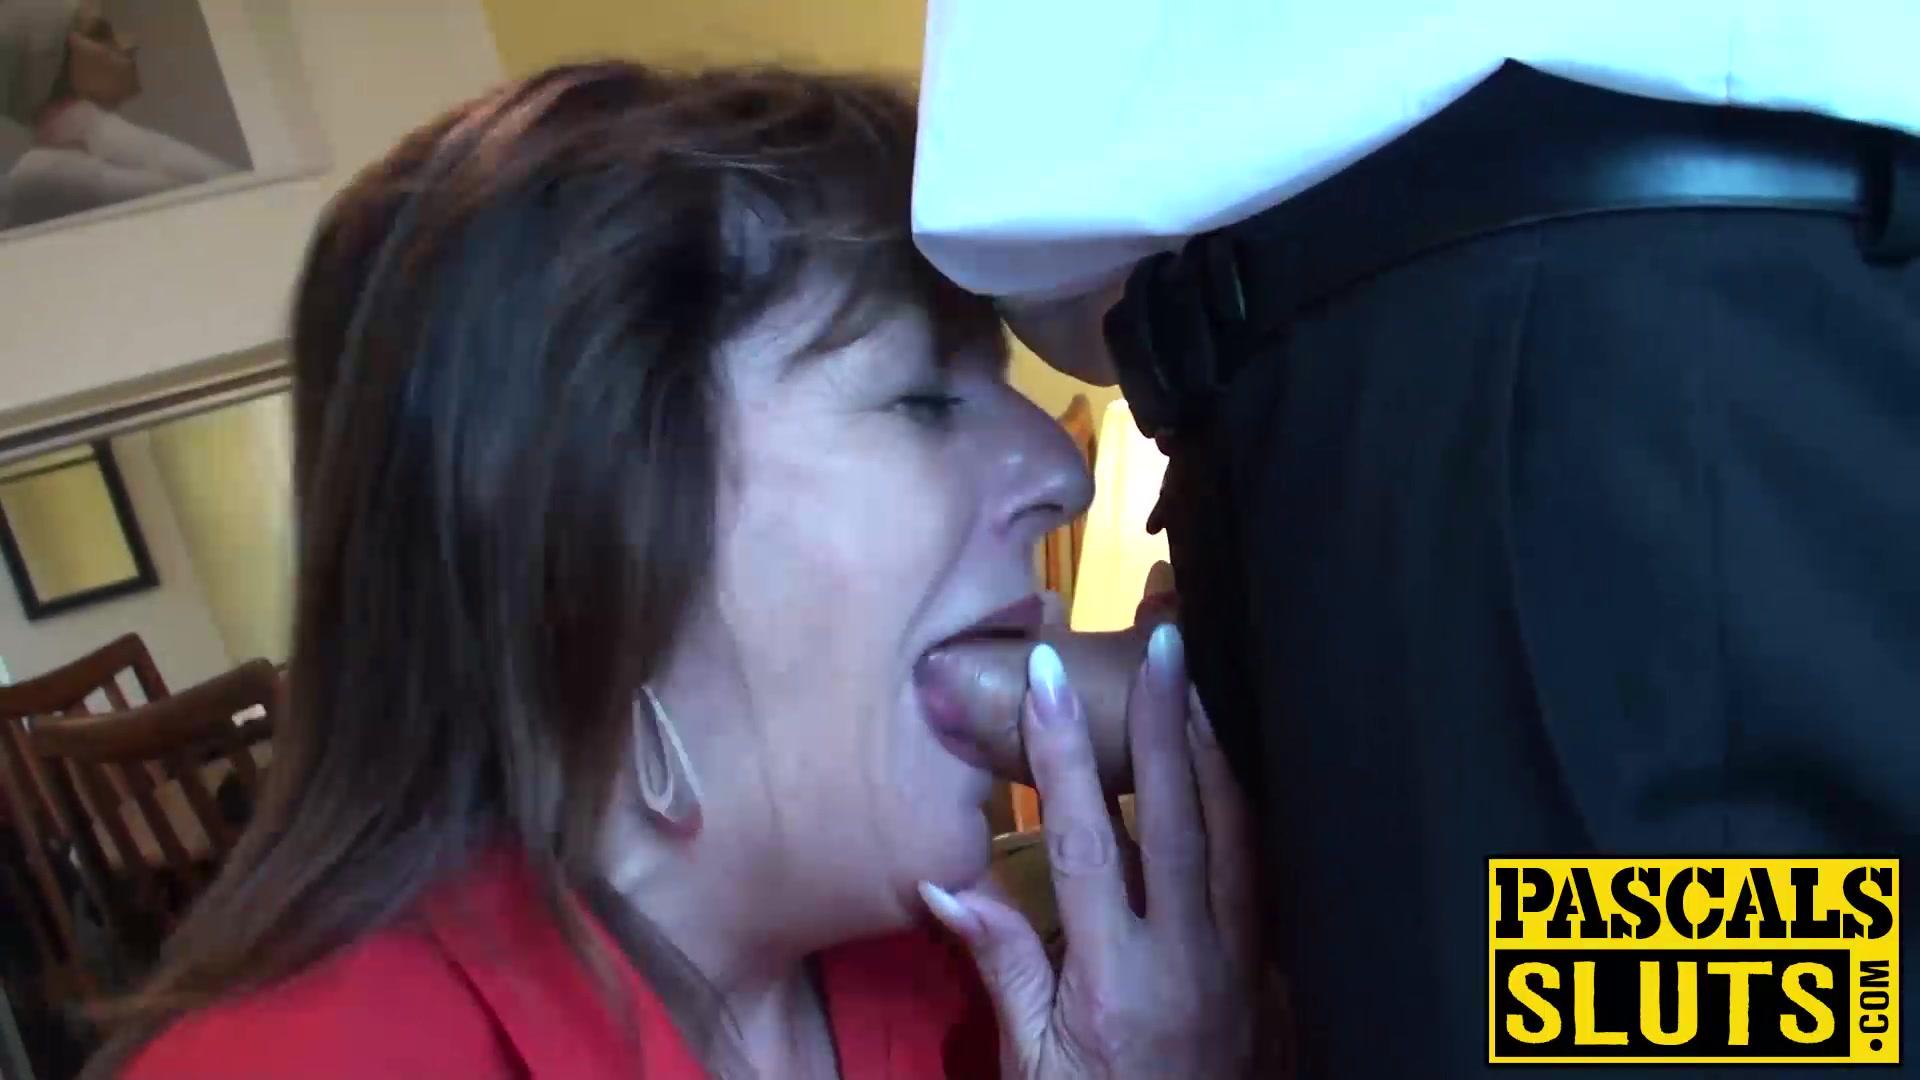 Divorced mature lady pandora enjoys having submissive sex 3